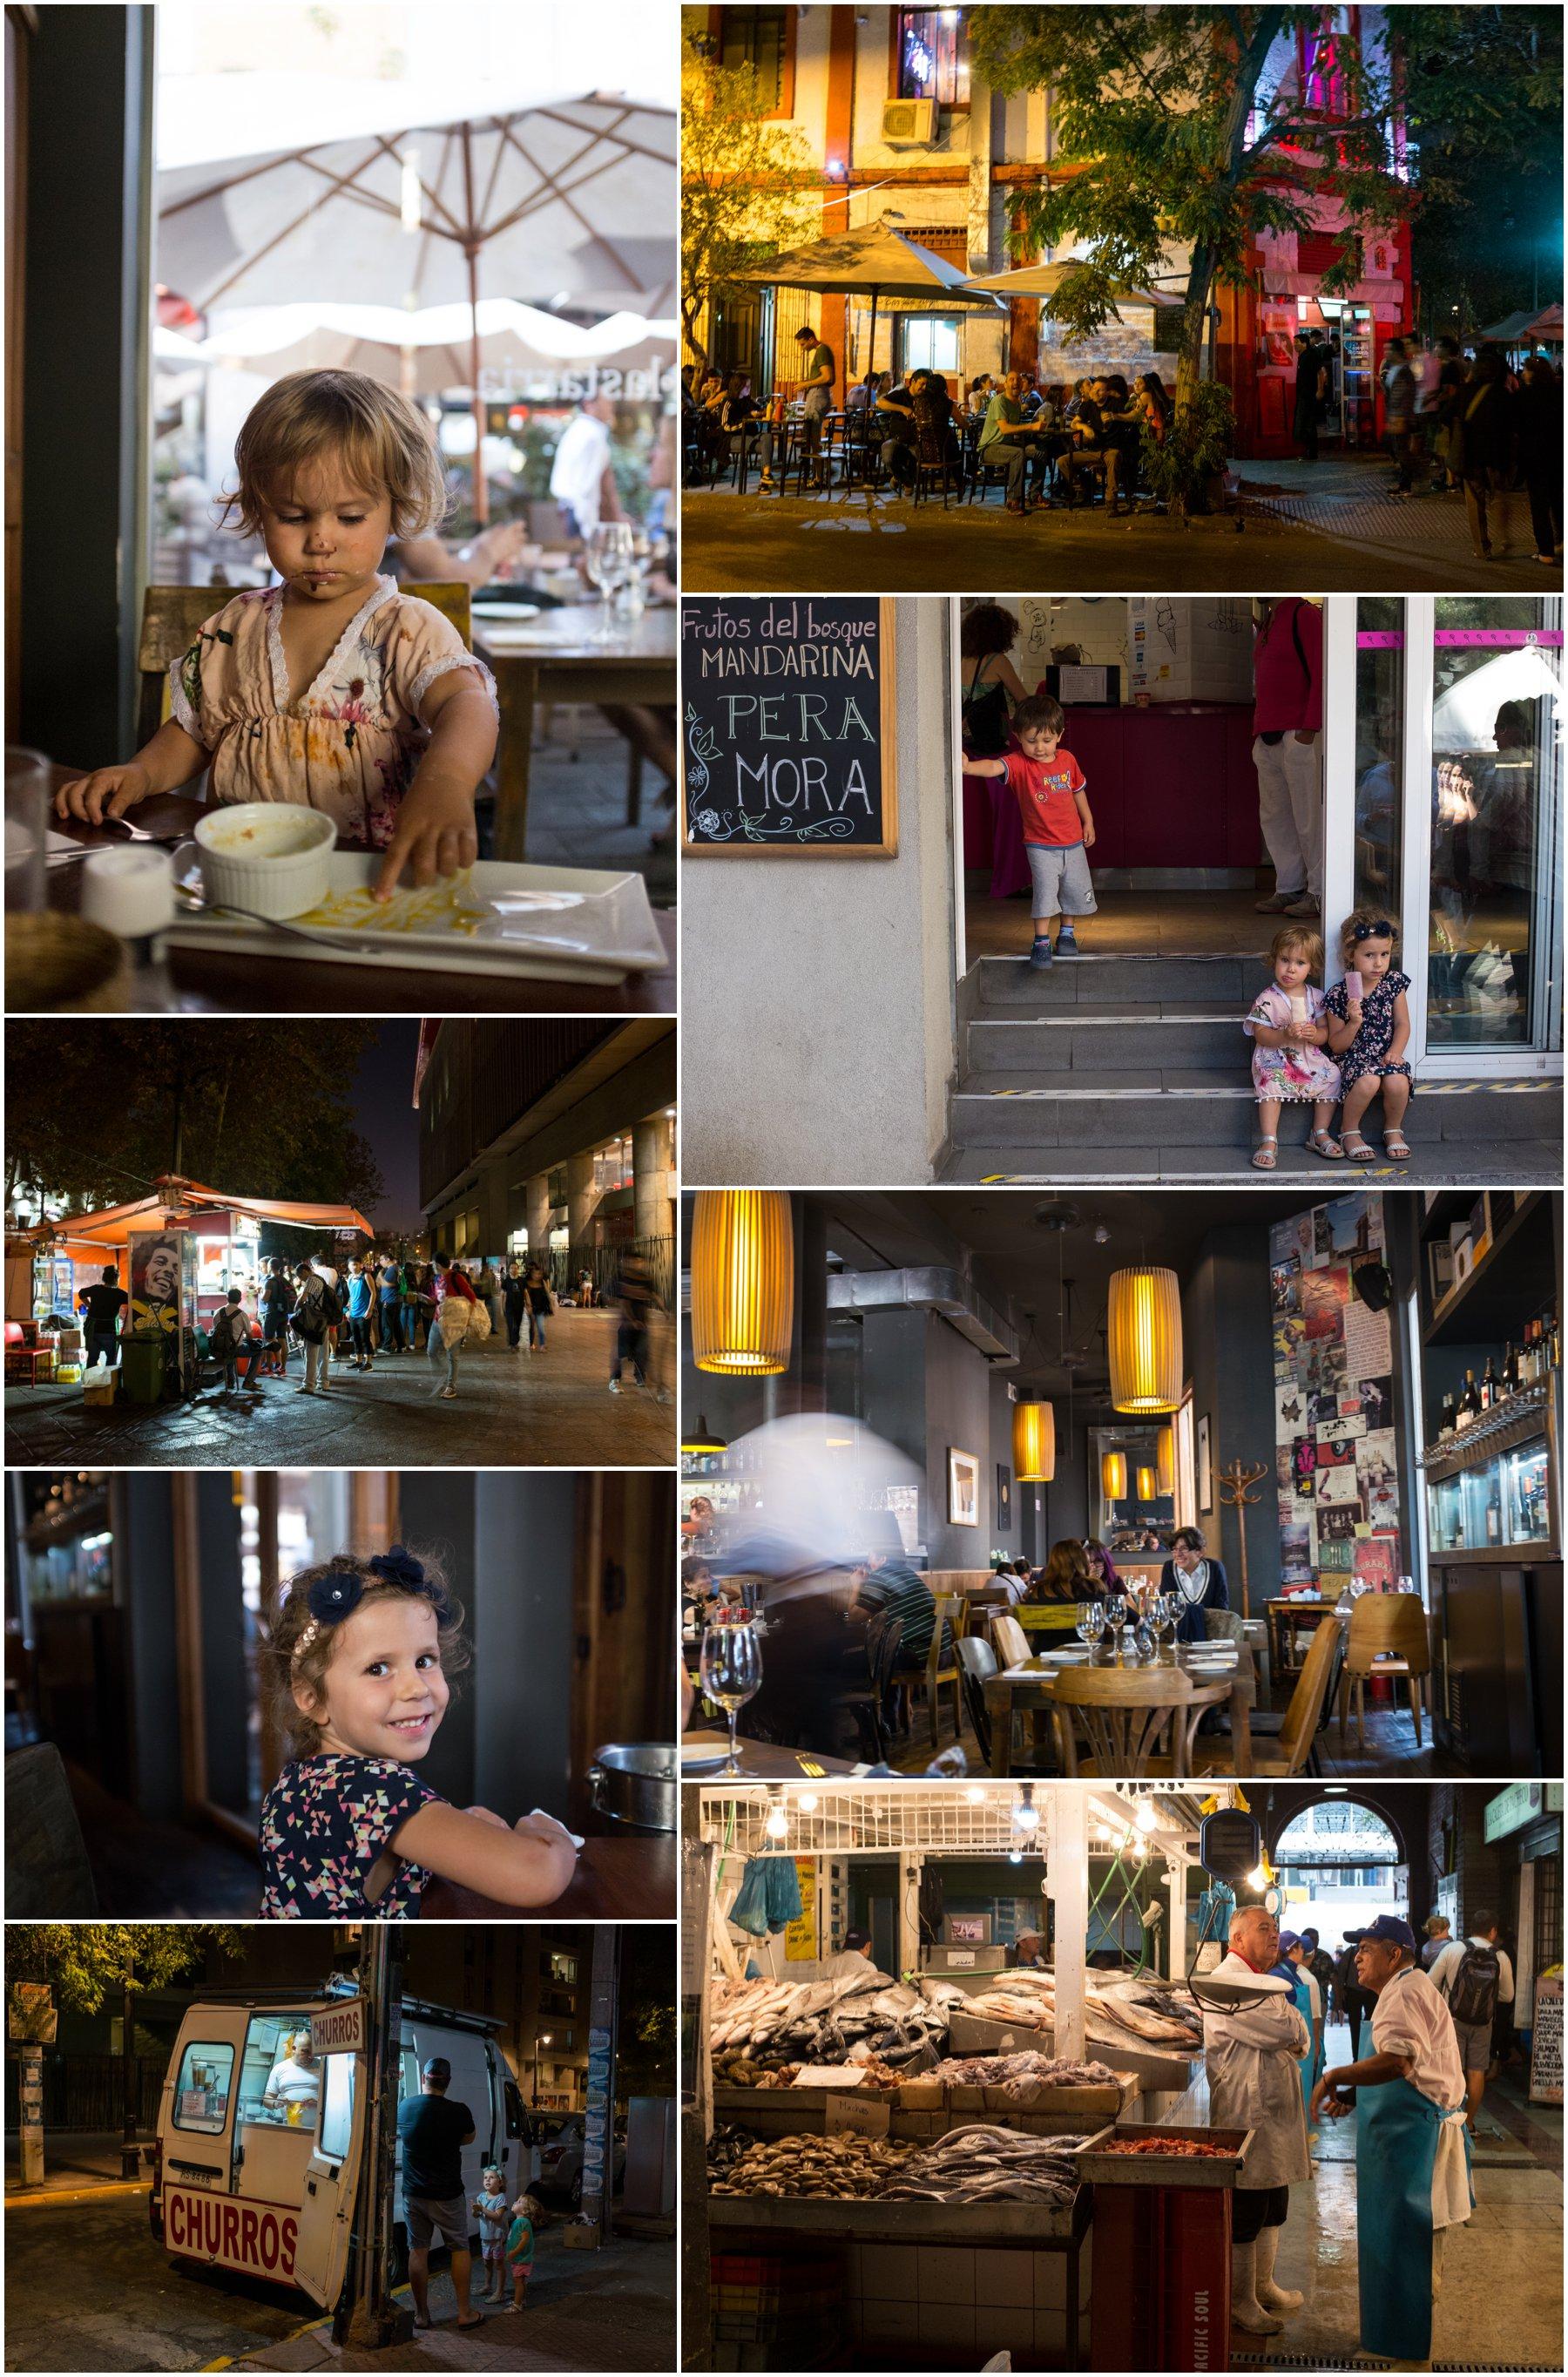 The Santiago food scene